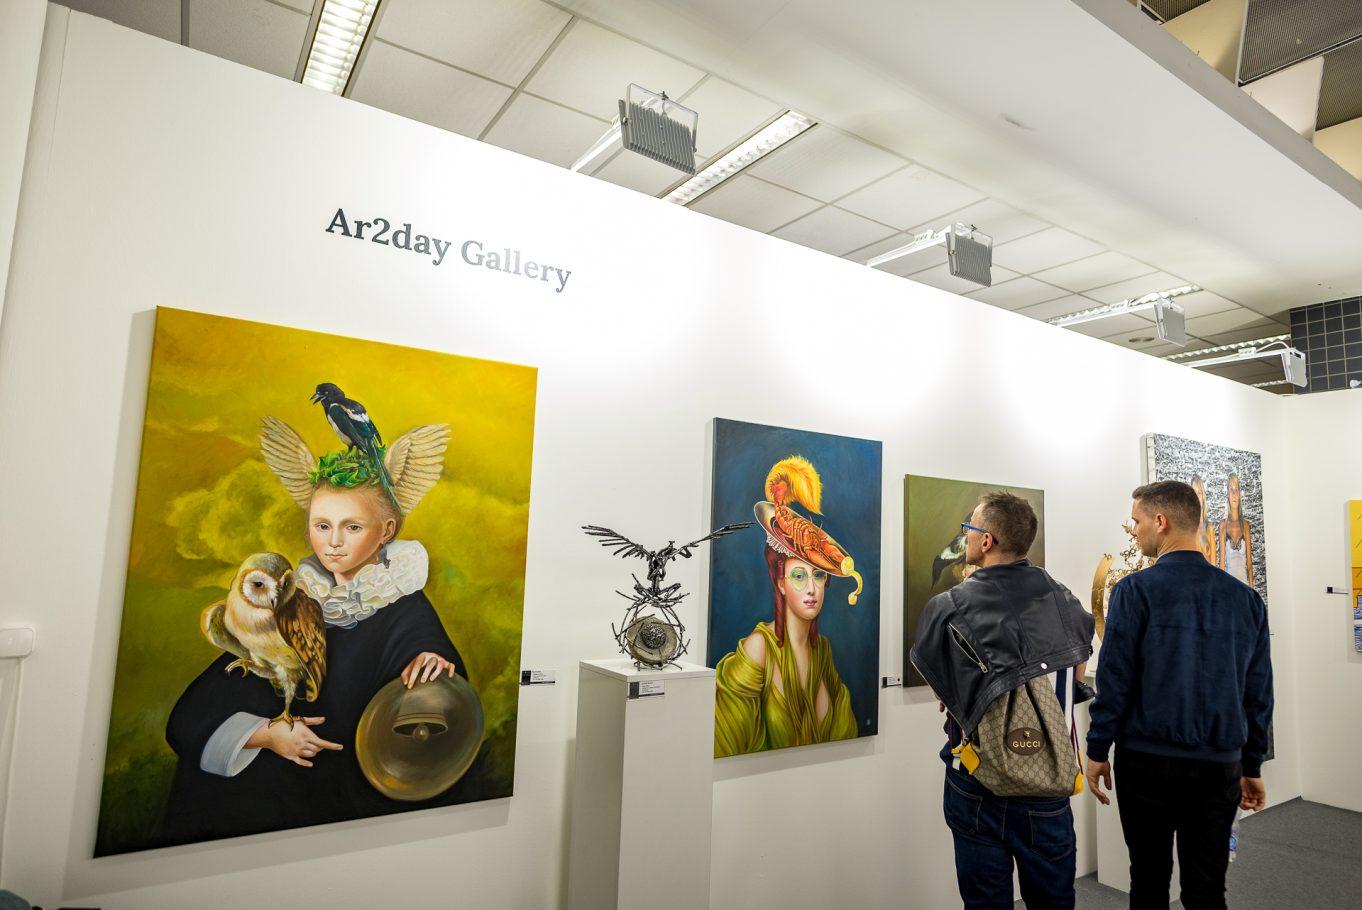 Ar2day Gallery Art & Antique Fair Millenáris